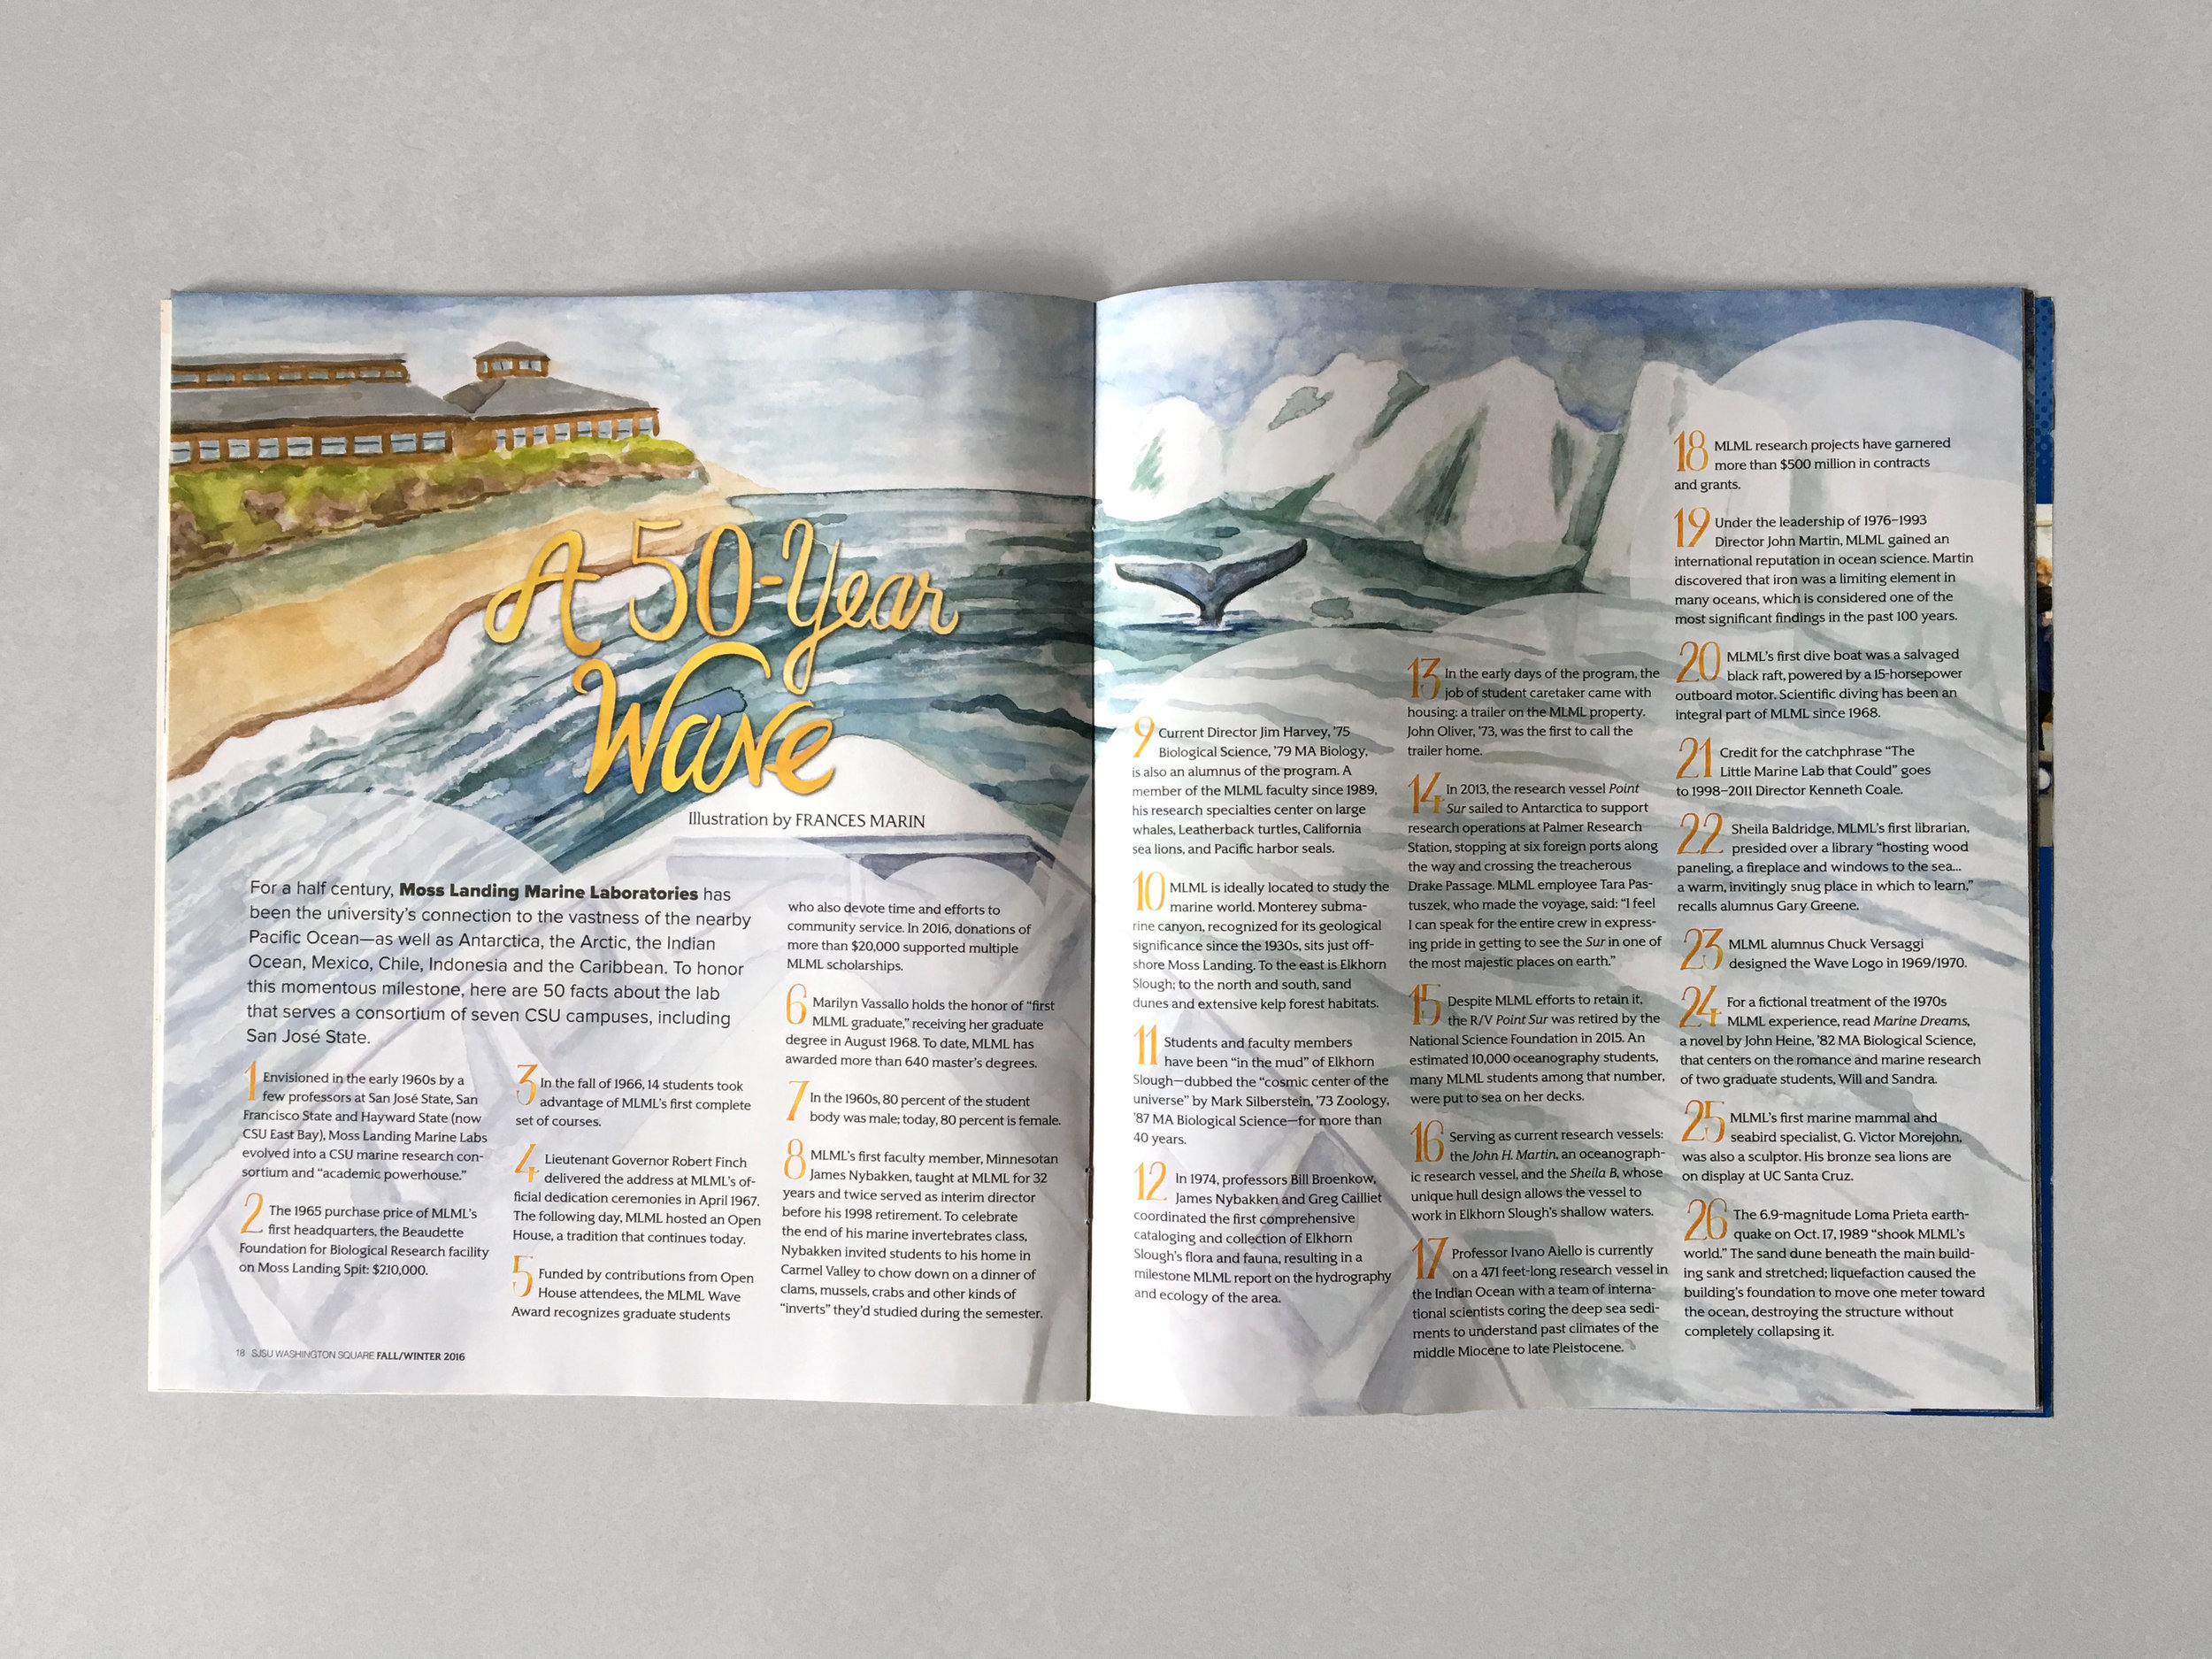 A 50-Year Wave for Washington Square Magazine